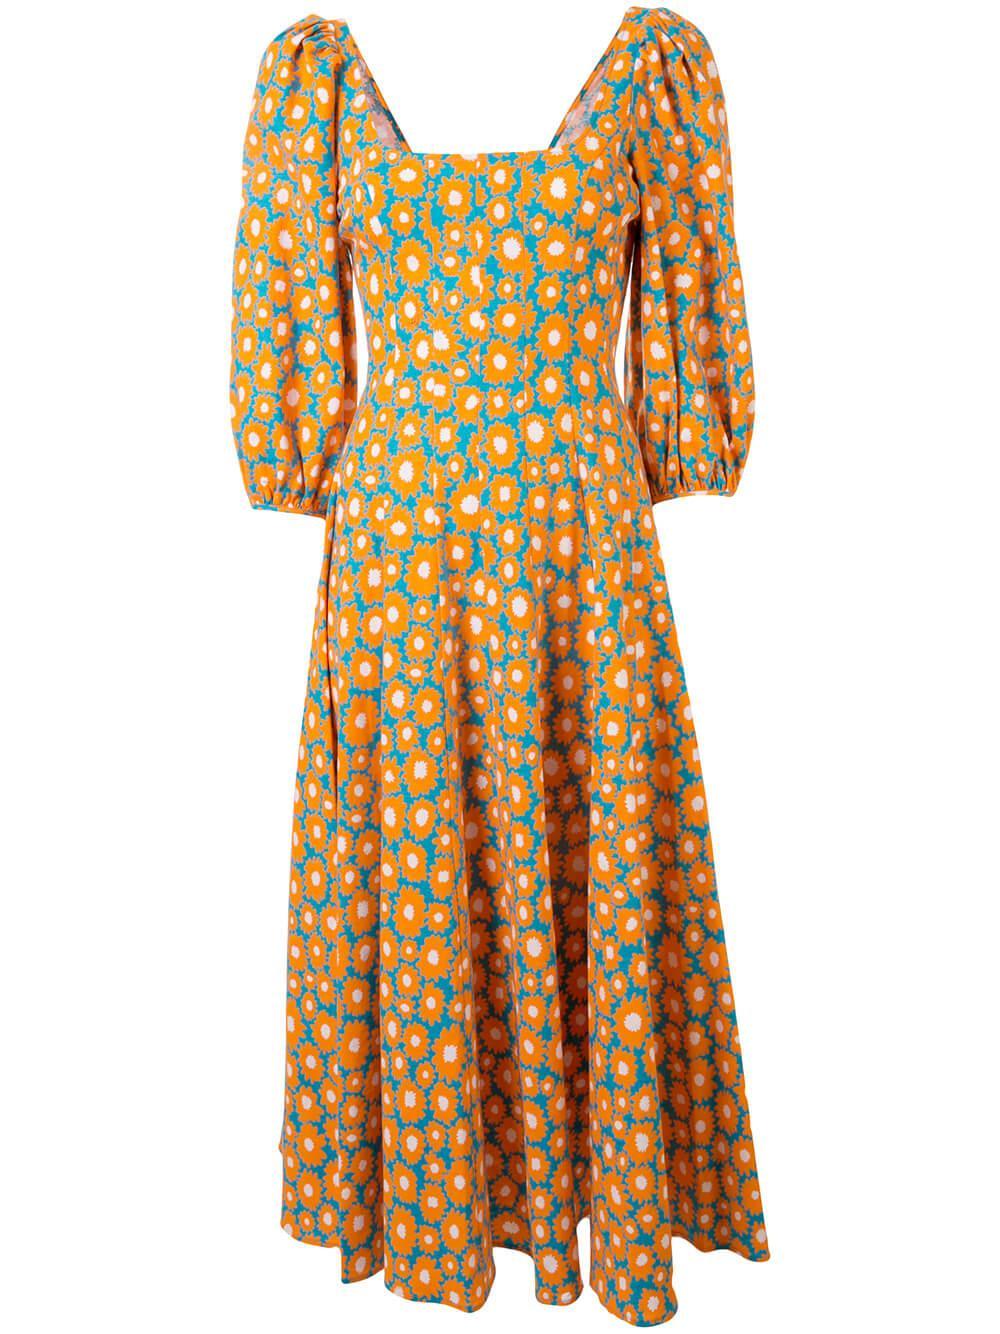 Swells Printed Linen Daisy Midi Dress